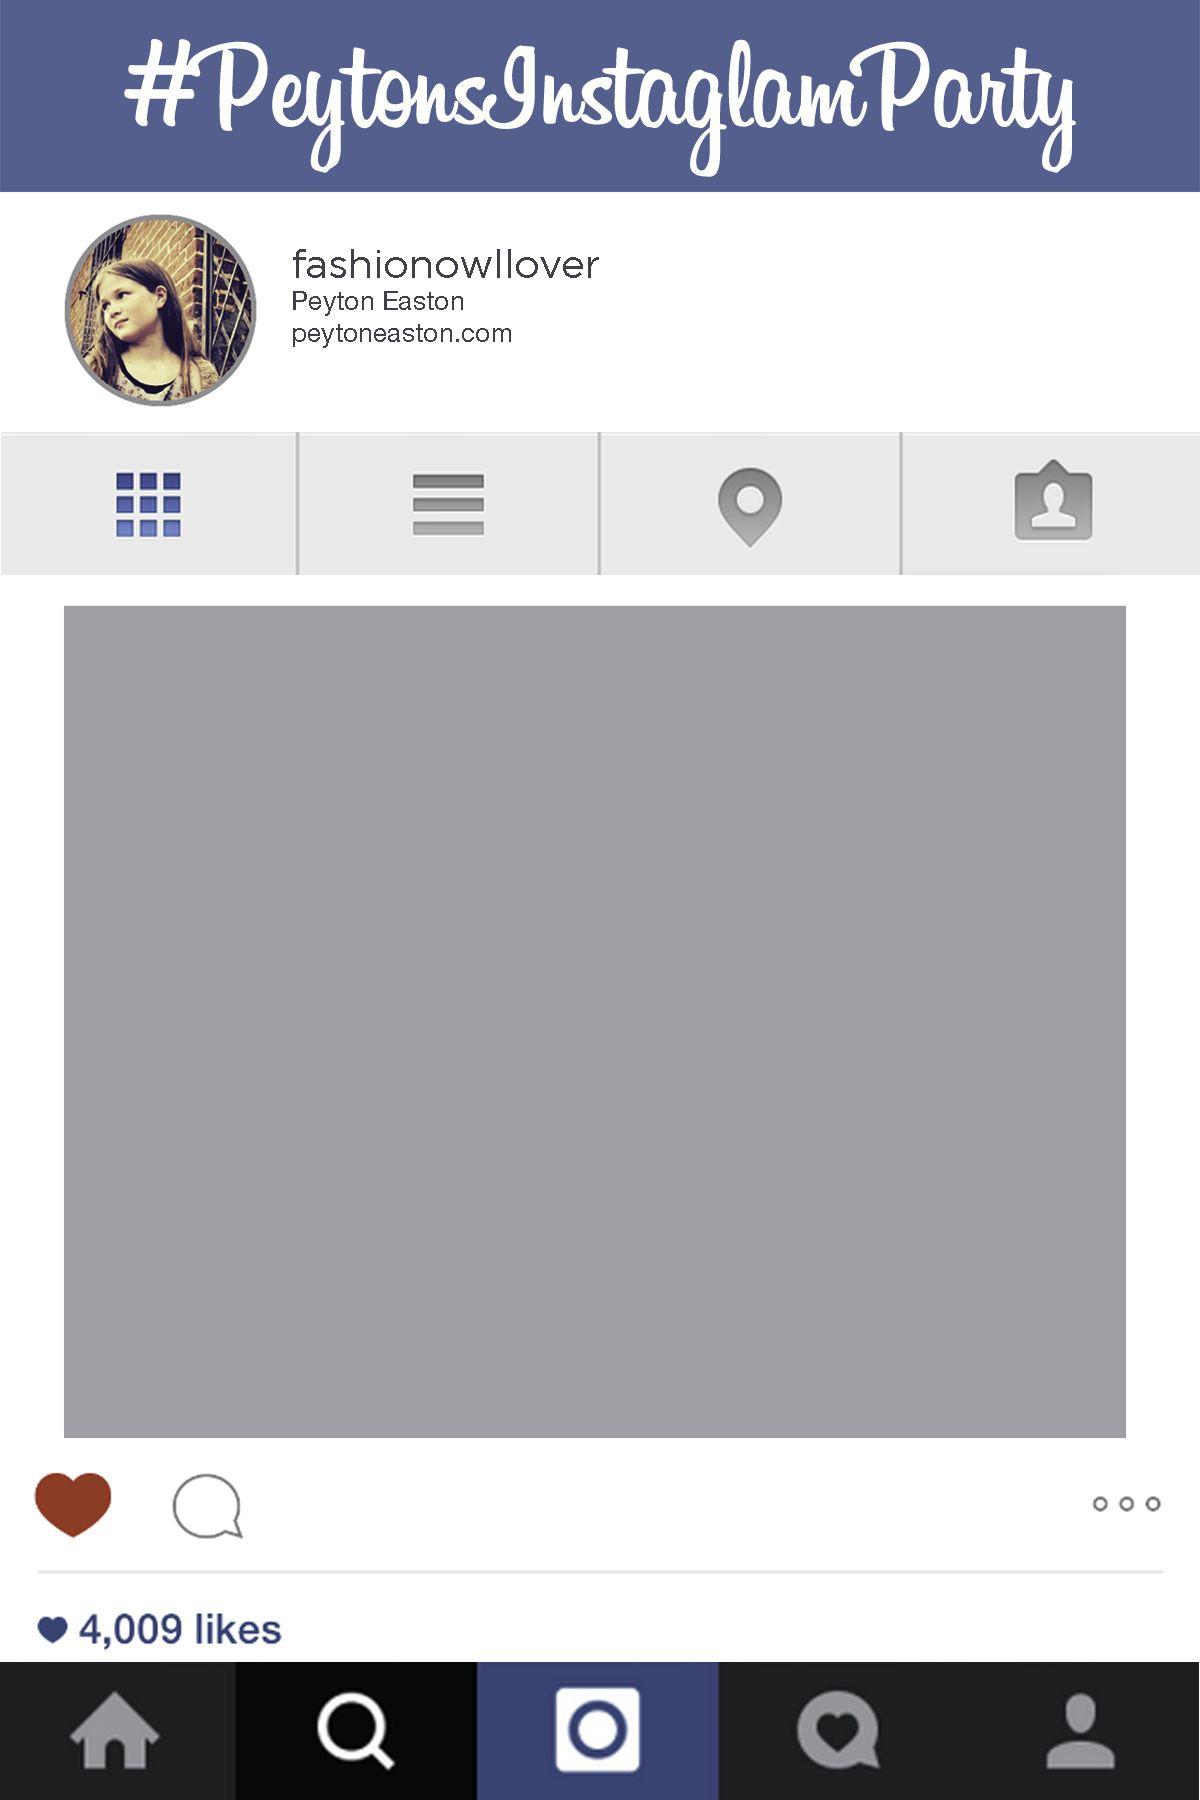 Cara Membuat Instagram Frame Photo Booth : membuat, instagram, frame, photo, booth, Desain, Photo, Booth, Quotes, Diary